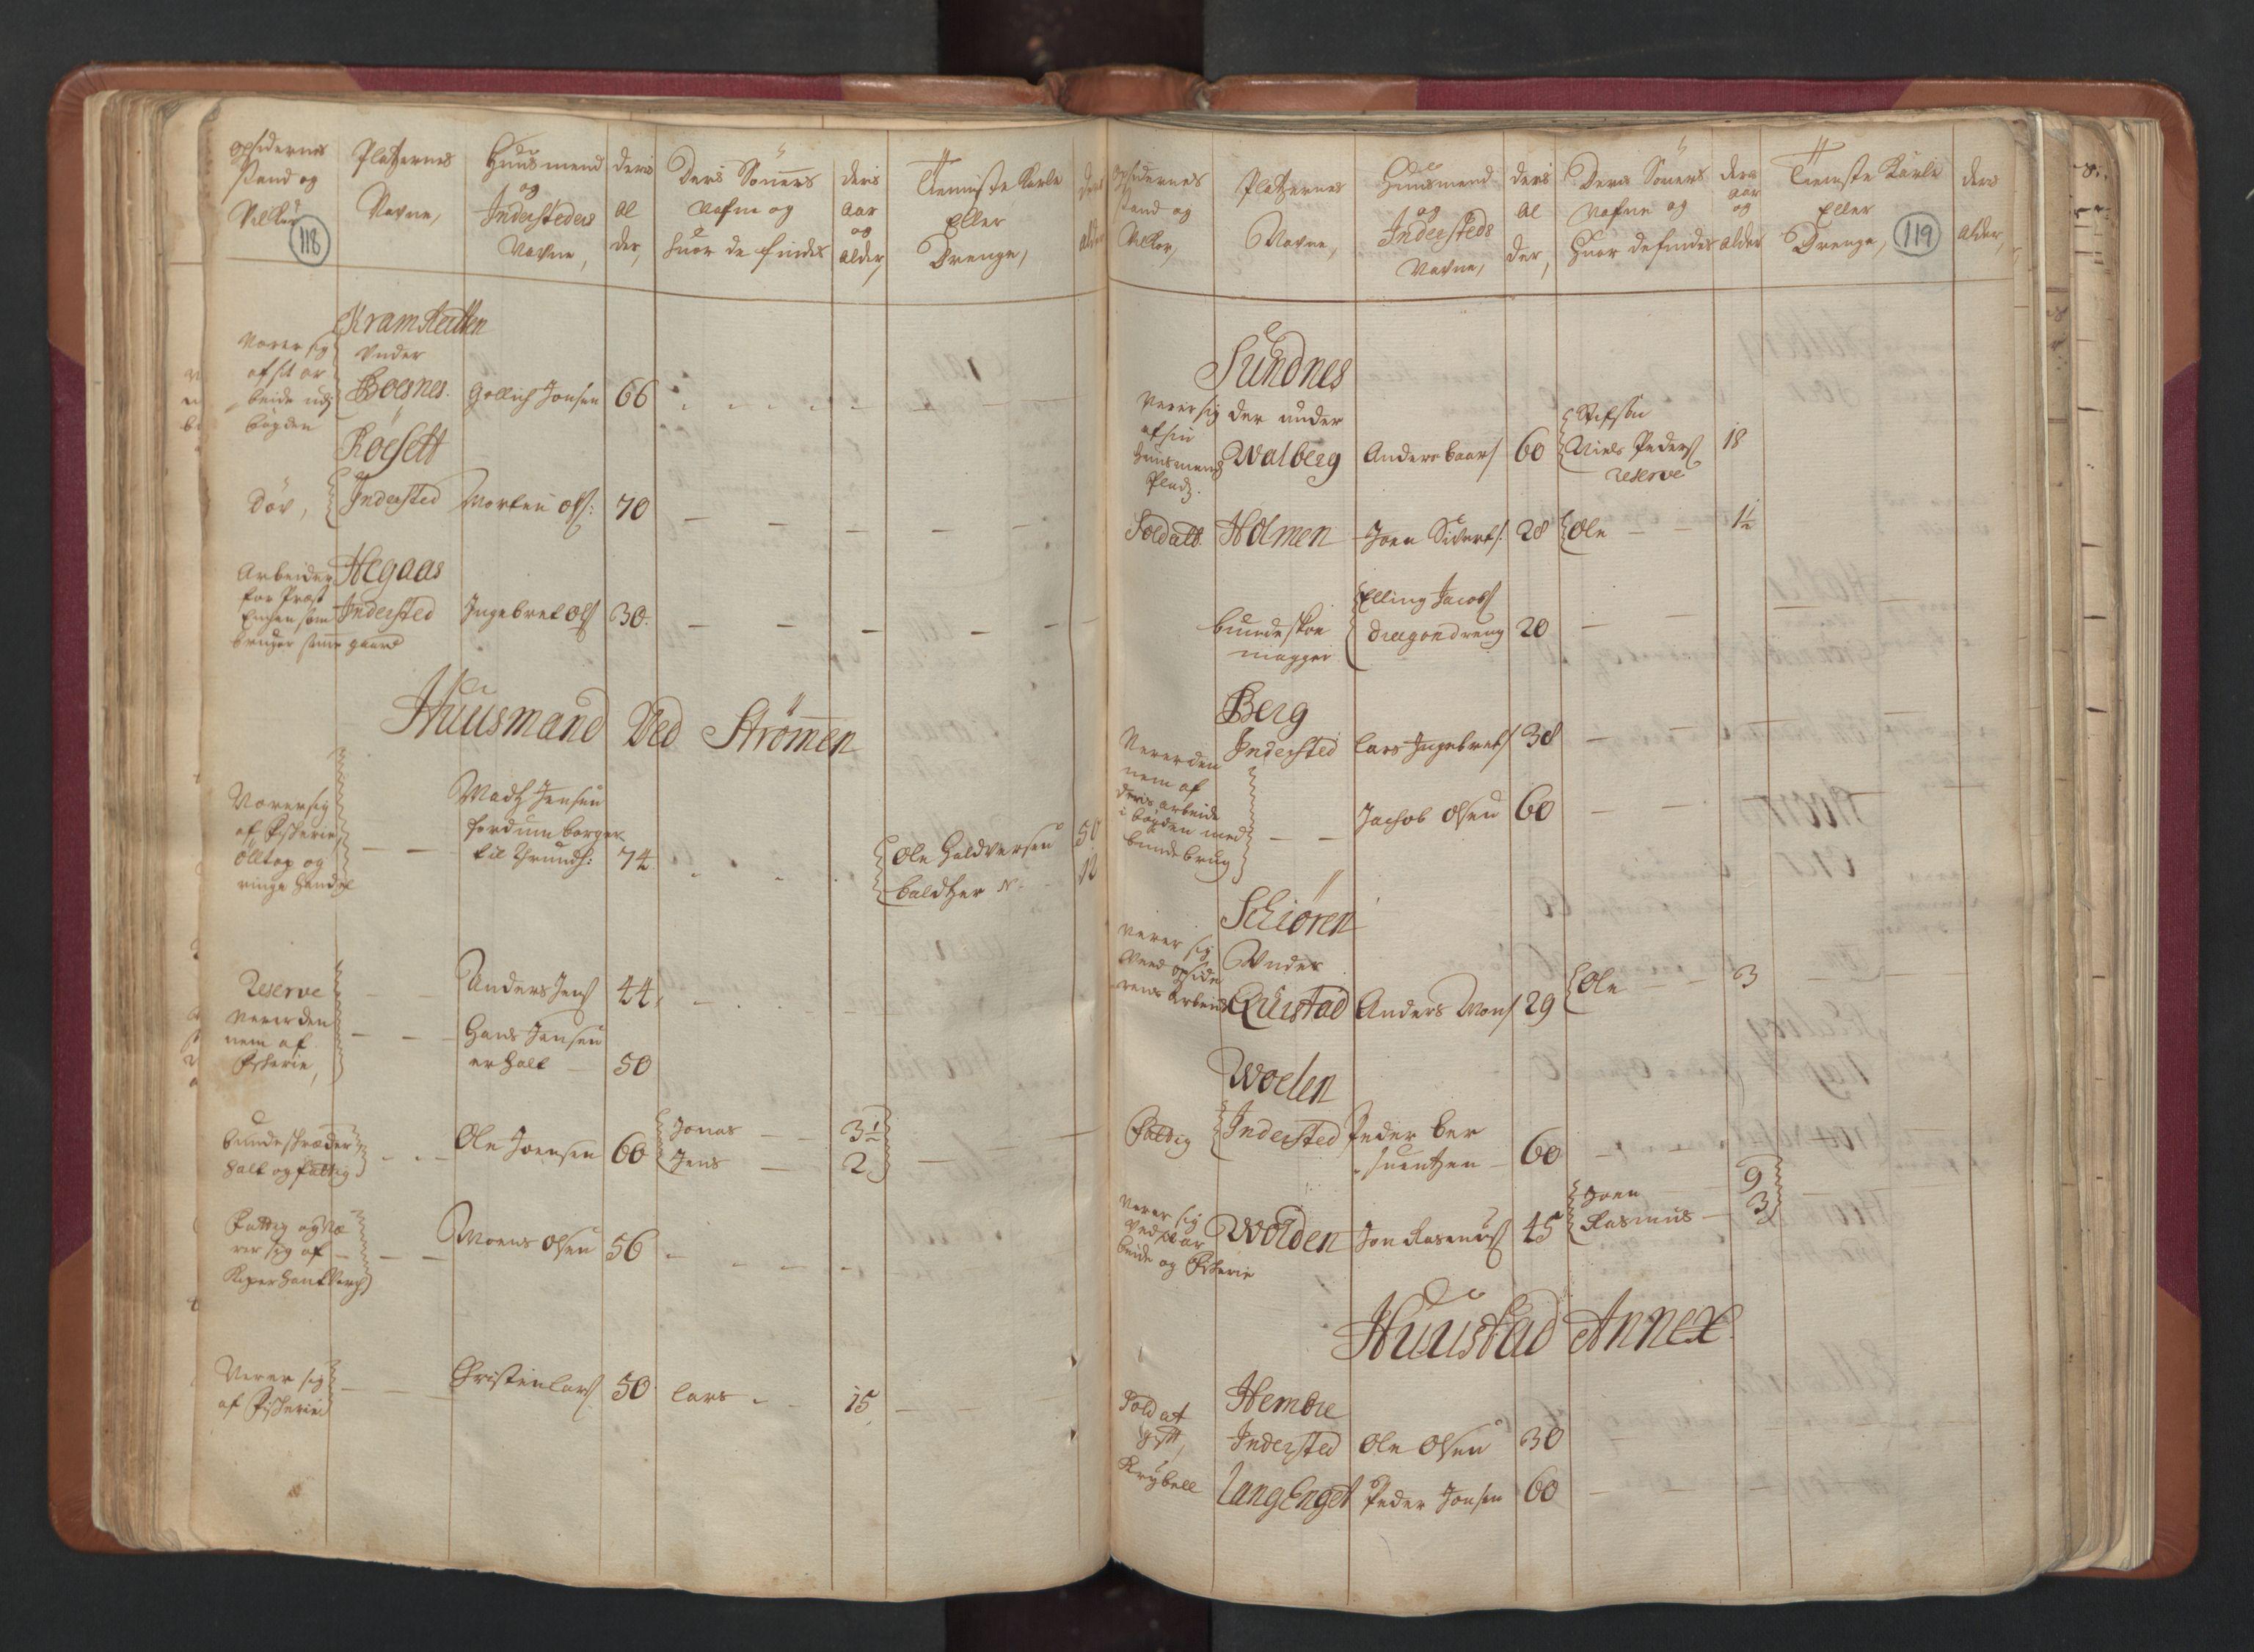 RA, Manntallet 1701, nr. 15: Inderøy fogderi og Namdal fogderi, 1701, s. 118-119